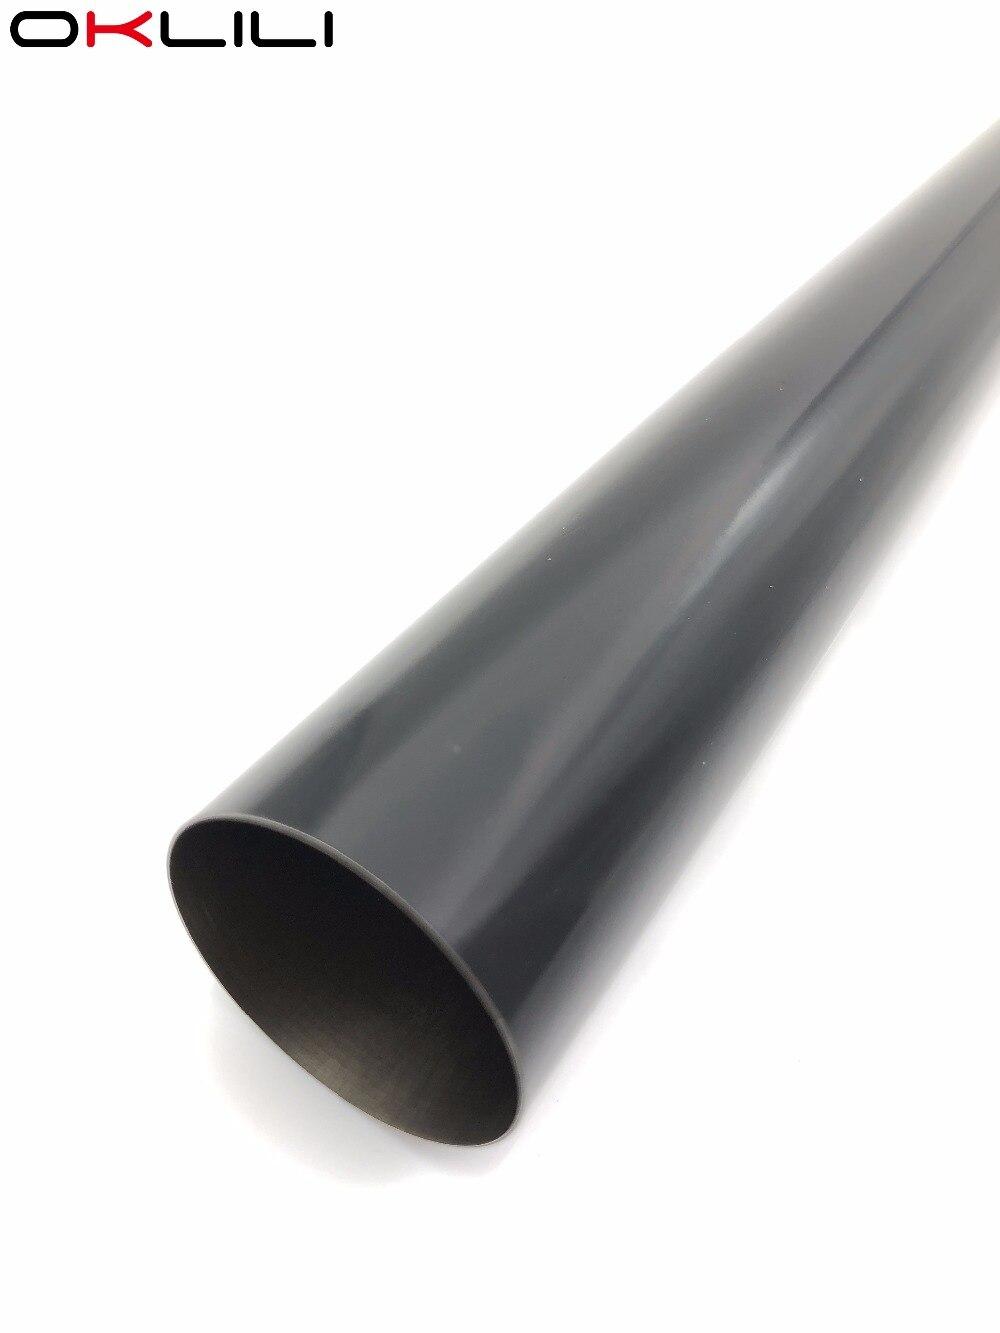 1X JAPAN 302RV93050 2RV93050 FK-1150 Fuser Fixing Film Sleeve for Kyocera ECOSYS P2040 P2235 M2040 M2135 M2540 M2635 M2640 M27351X JAPAN 302RV93050 2RV93050 FK-1150 Fuser Fixing Film Sleeve for Kyocera ECOSYS P2040 P2235 M2040 M2135 M2540 M2635 M2640 M2735